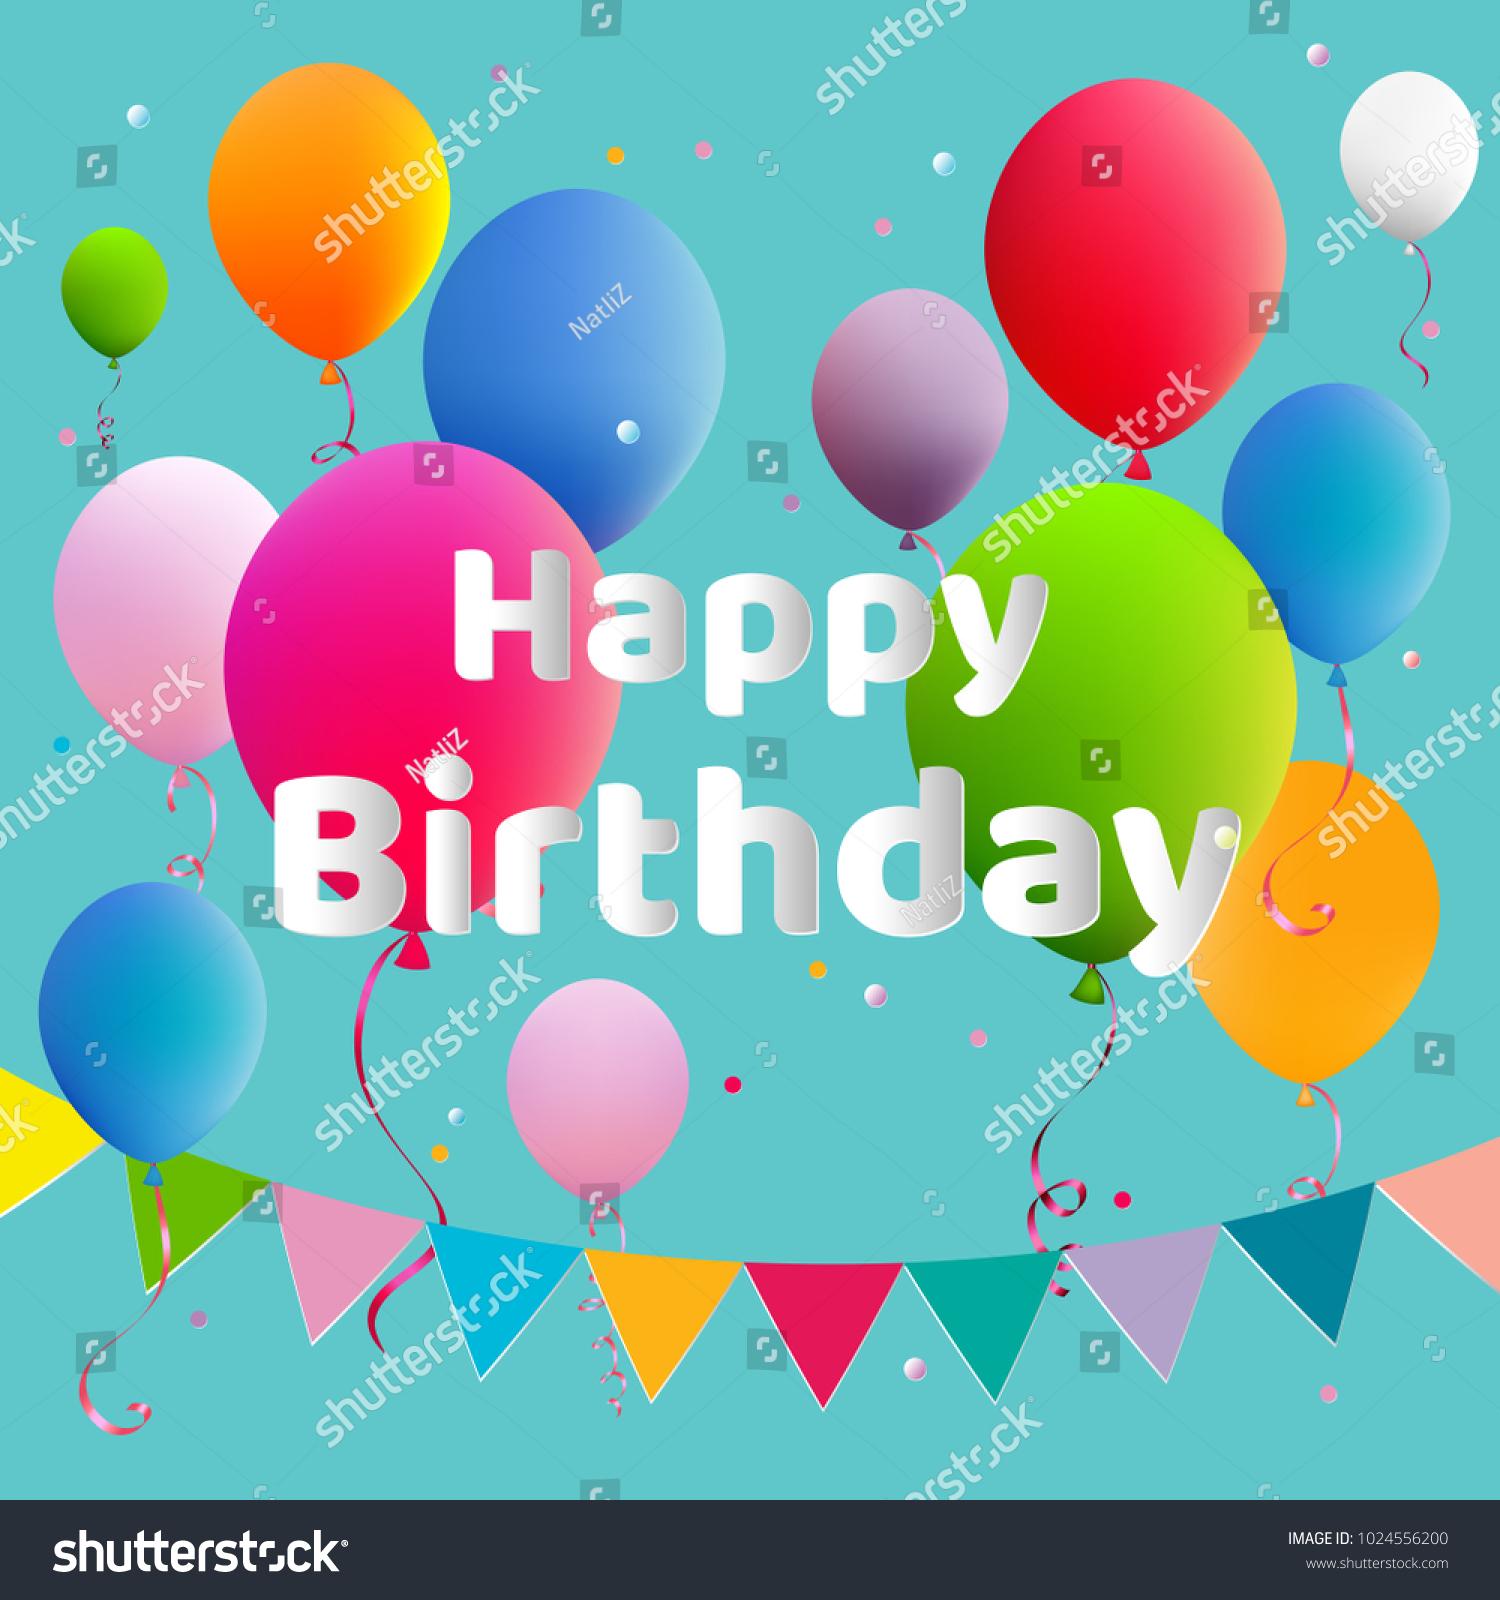 Happy Birthday Balloons Anniversary Decoration Celebration Vector Illustration